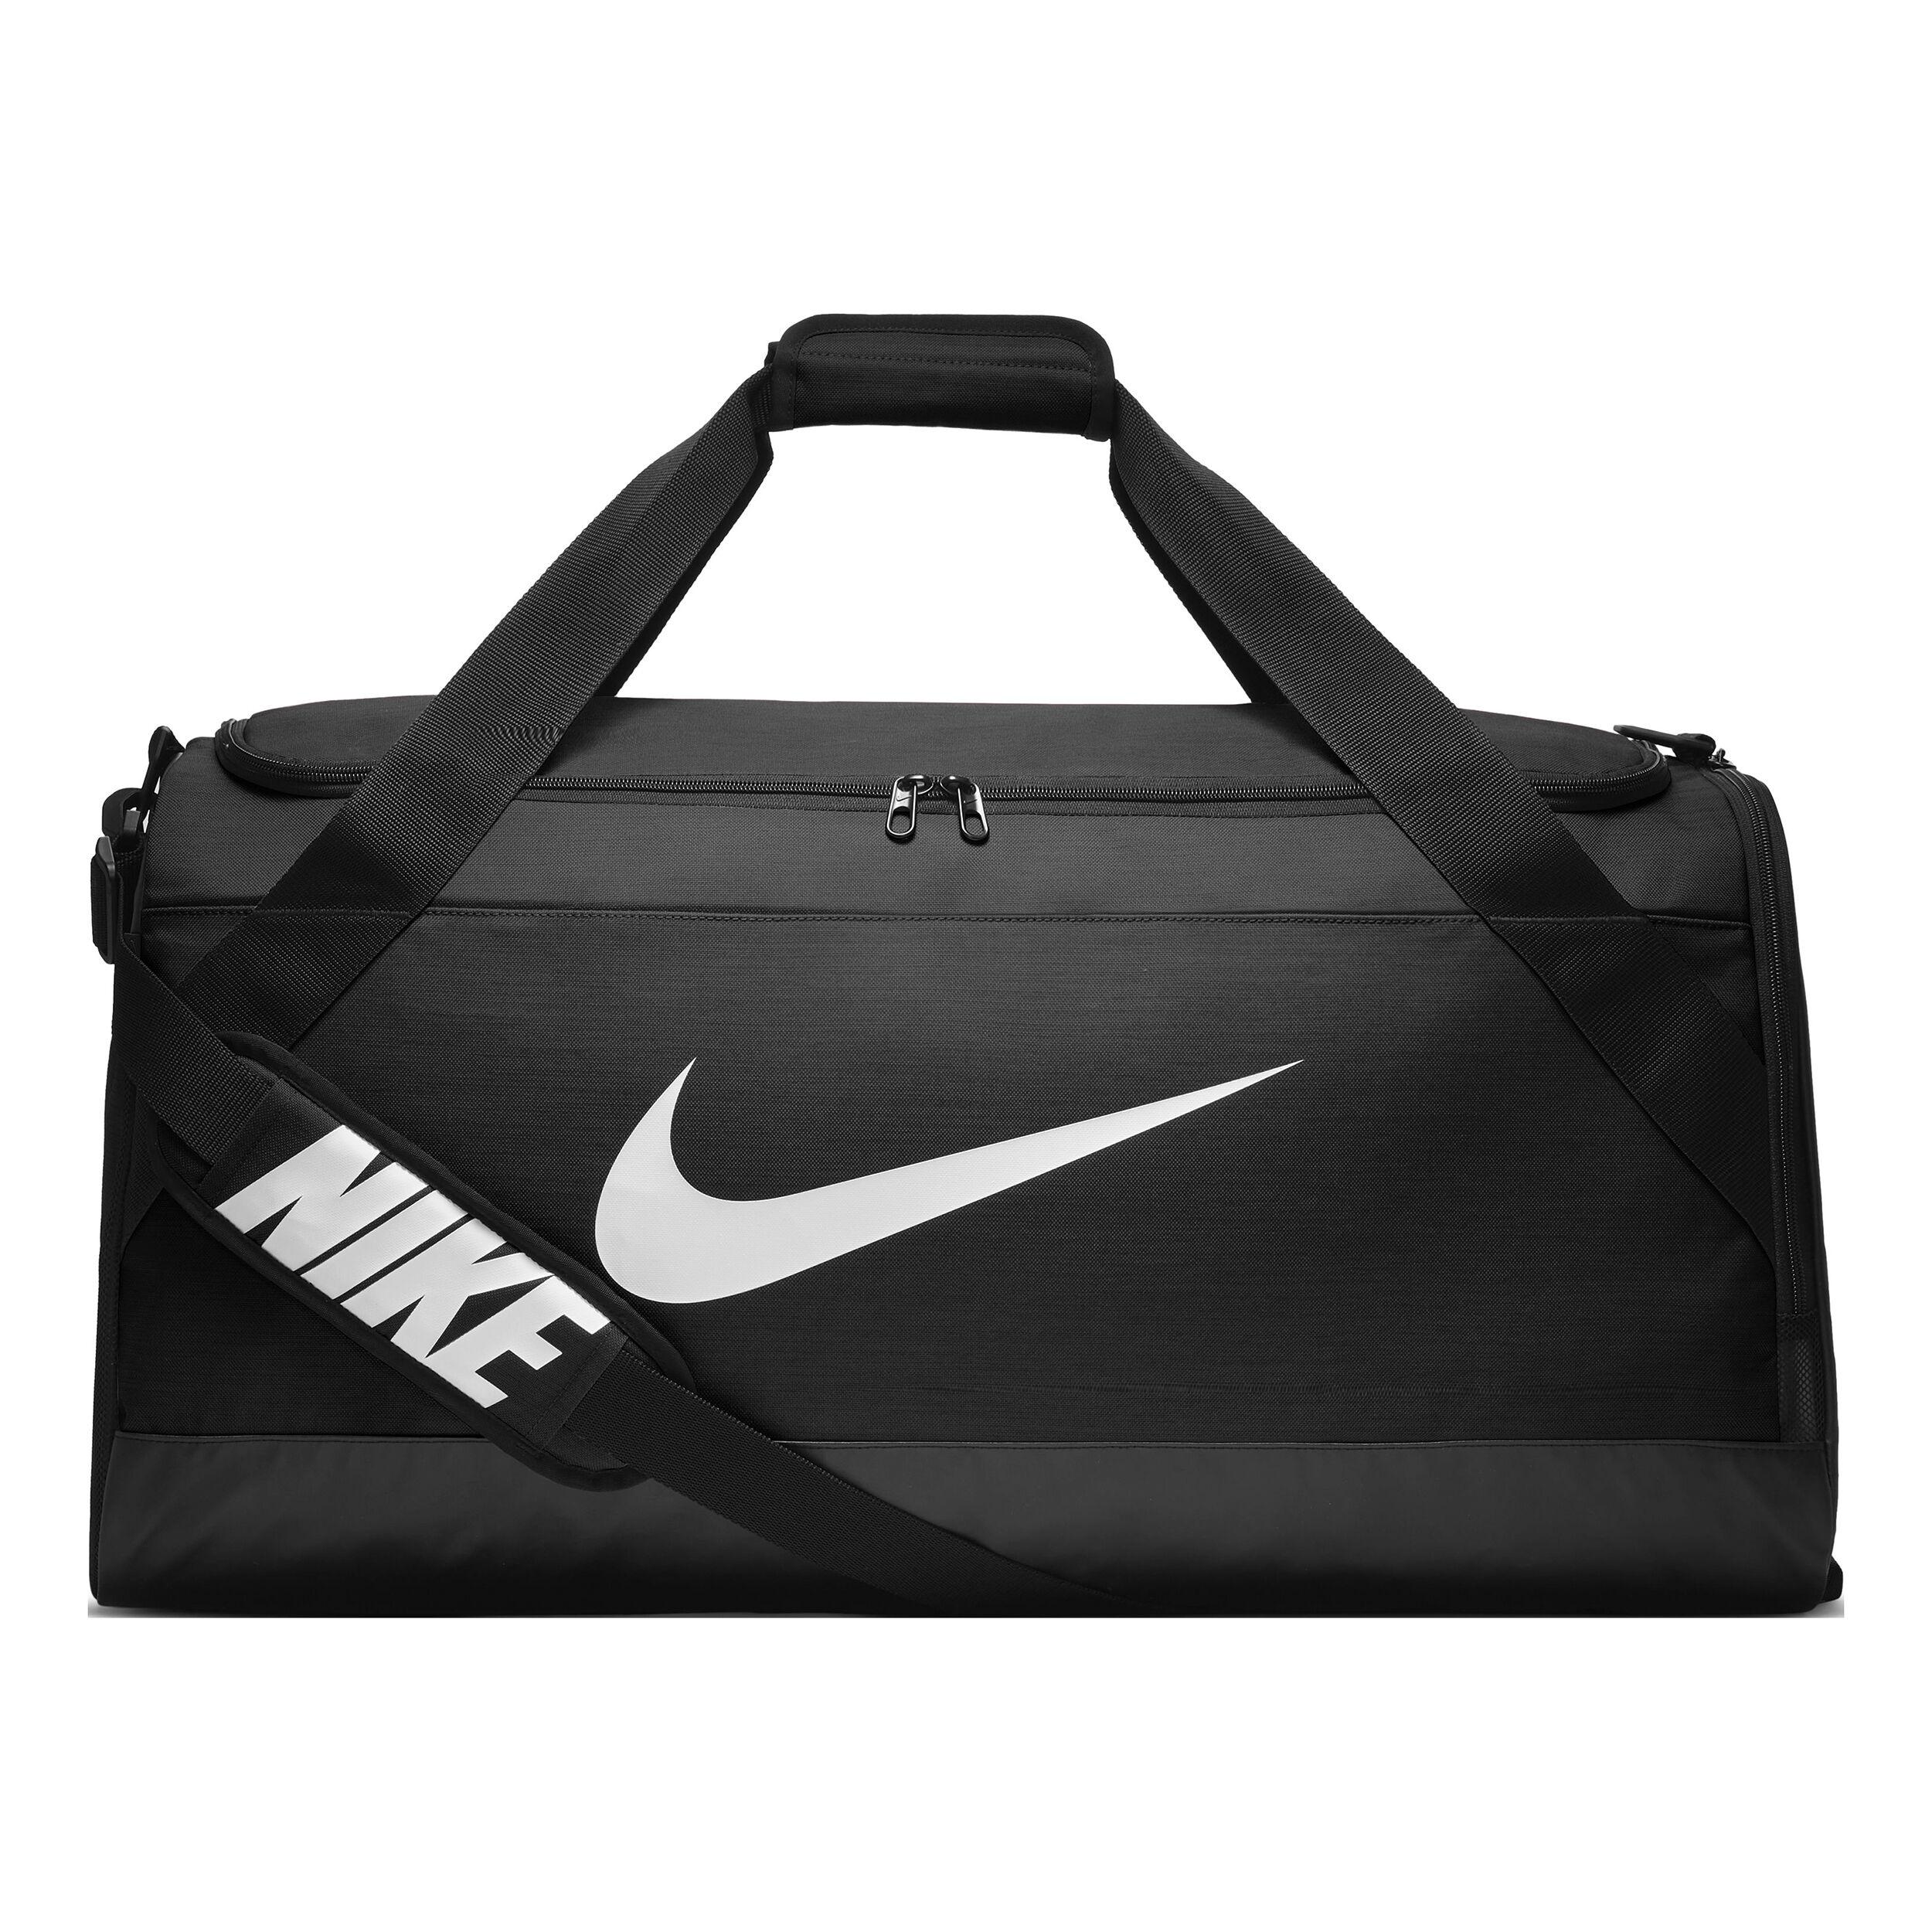 Duffel Deporte NegroNegro Compra Brasilia Nike Bolsa Grande 7Y6yfgvb